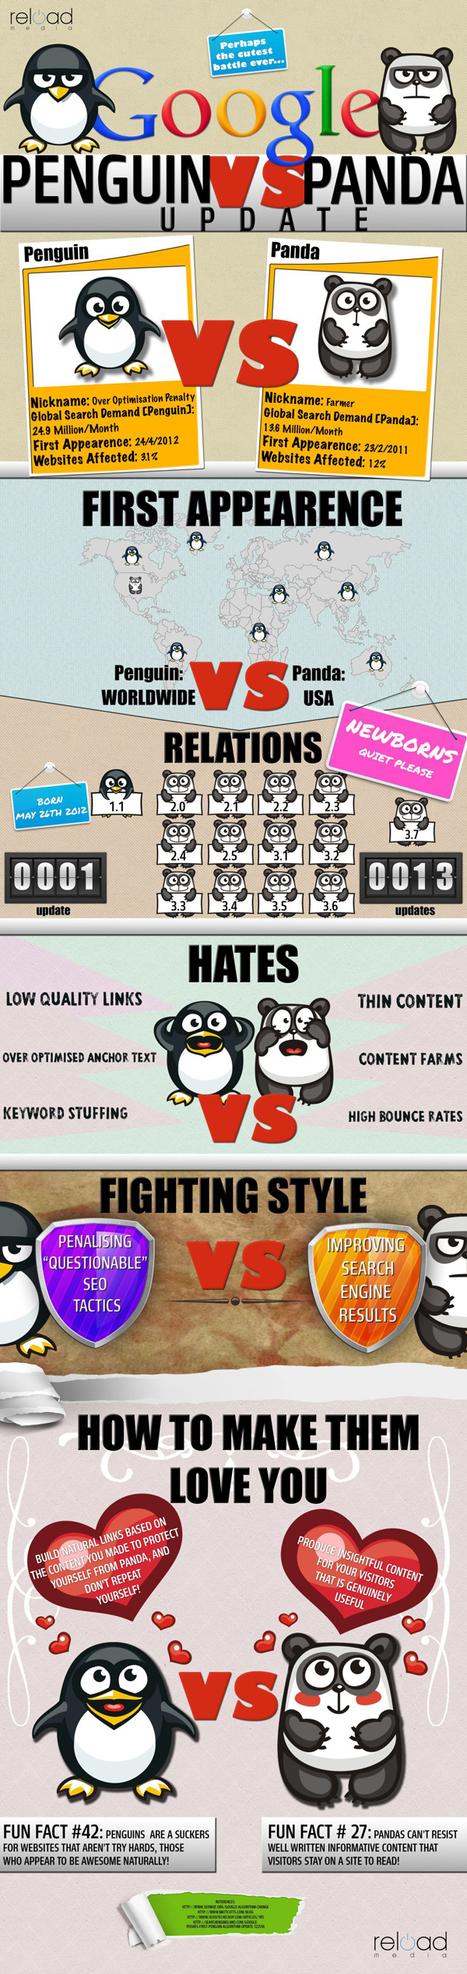 The History of Google Panda & Penguin, Abridged | Marketing & Webmarketing | Scoop.it